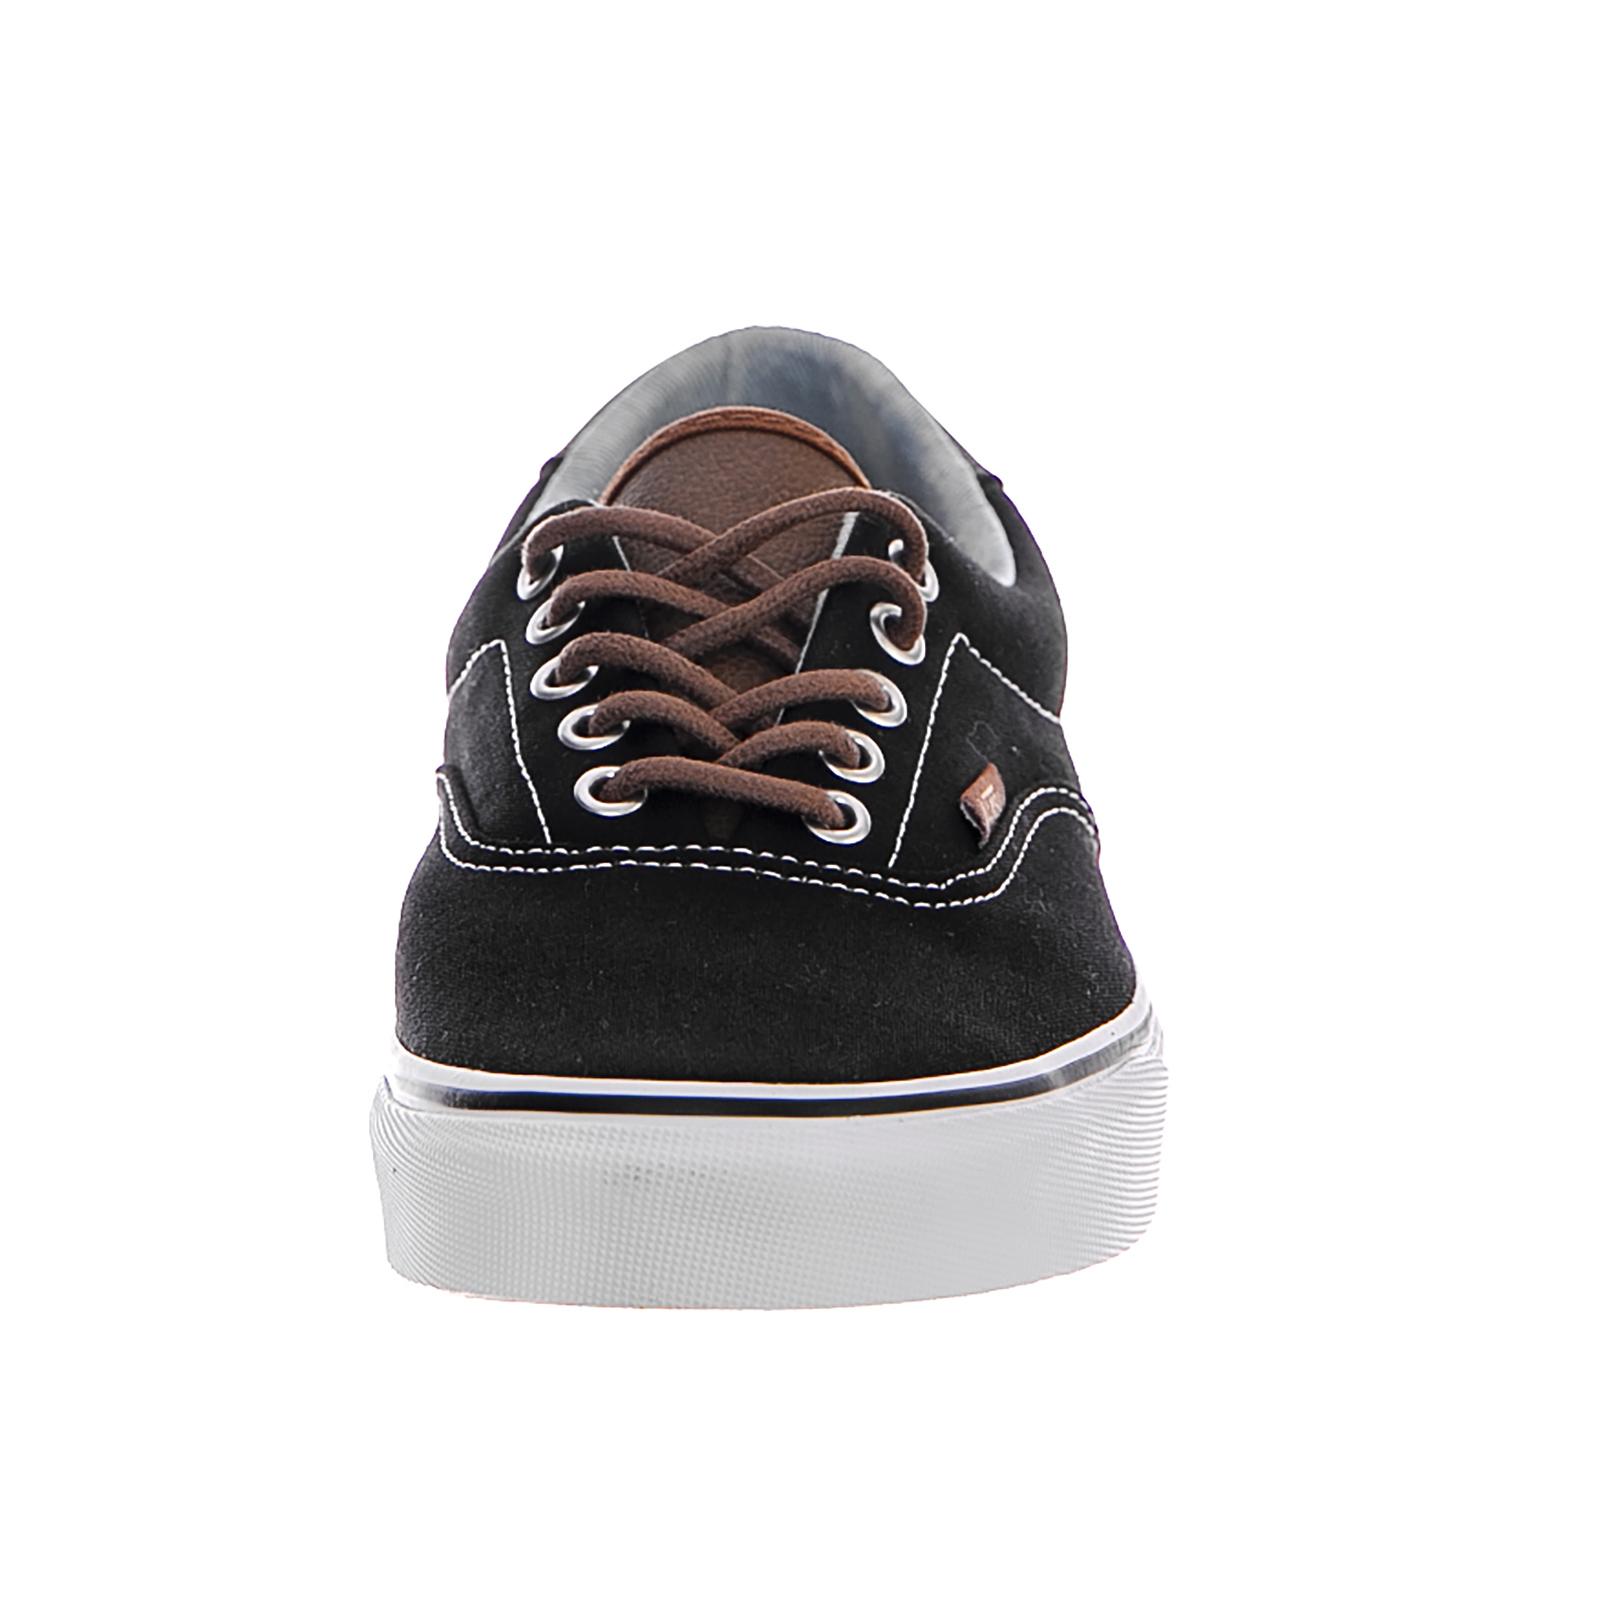 Vans-Zapatillas-Fue-Ua-59-C-amp-L-Black-acido-Denim-Negro